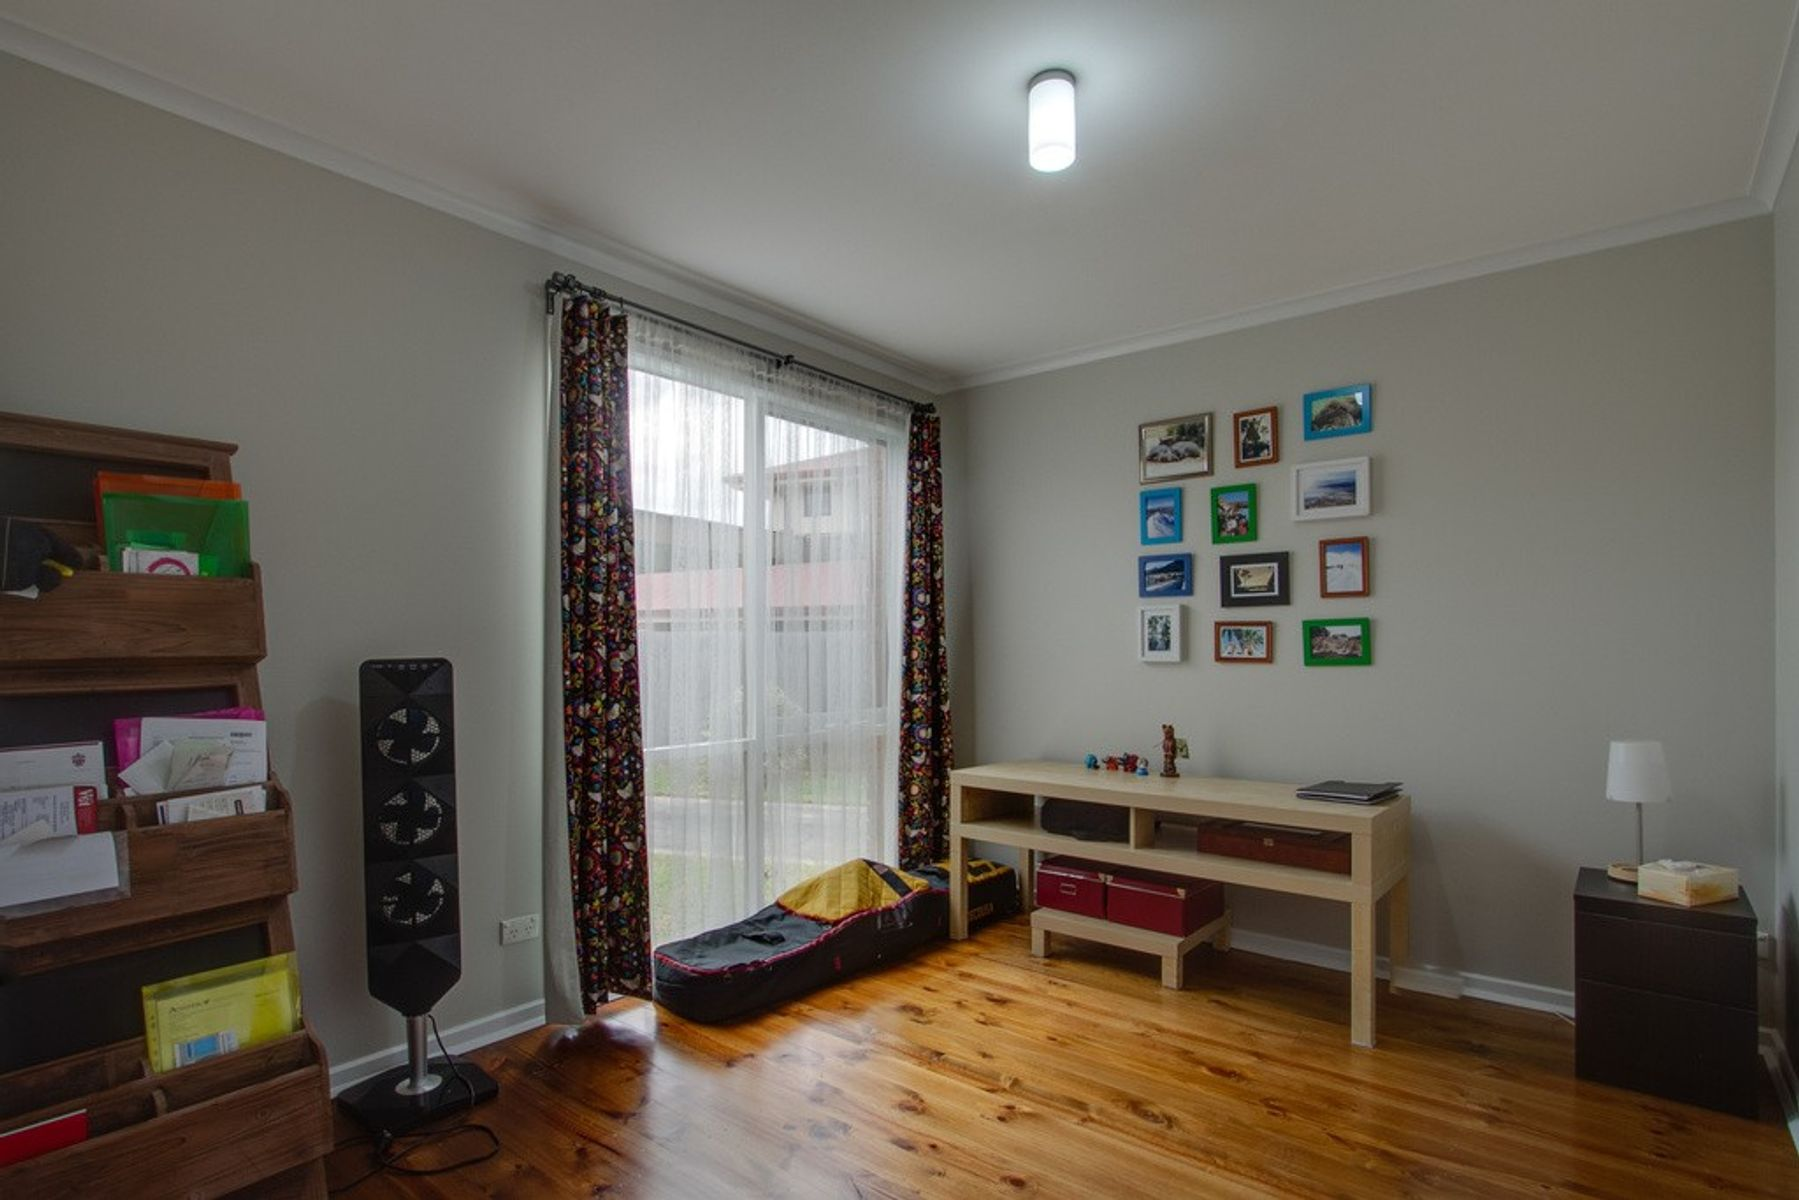 21 Trefoil Street, Ferntree Gully, VIC 3156